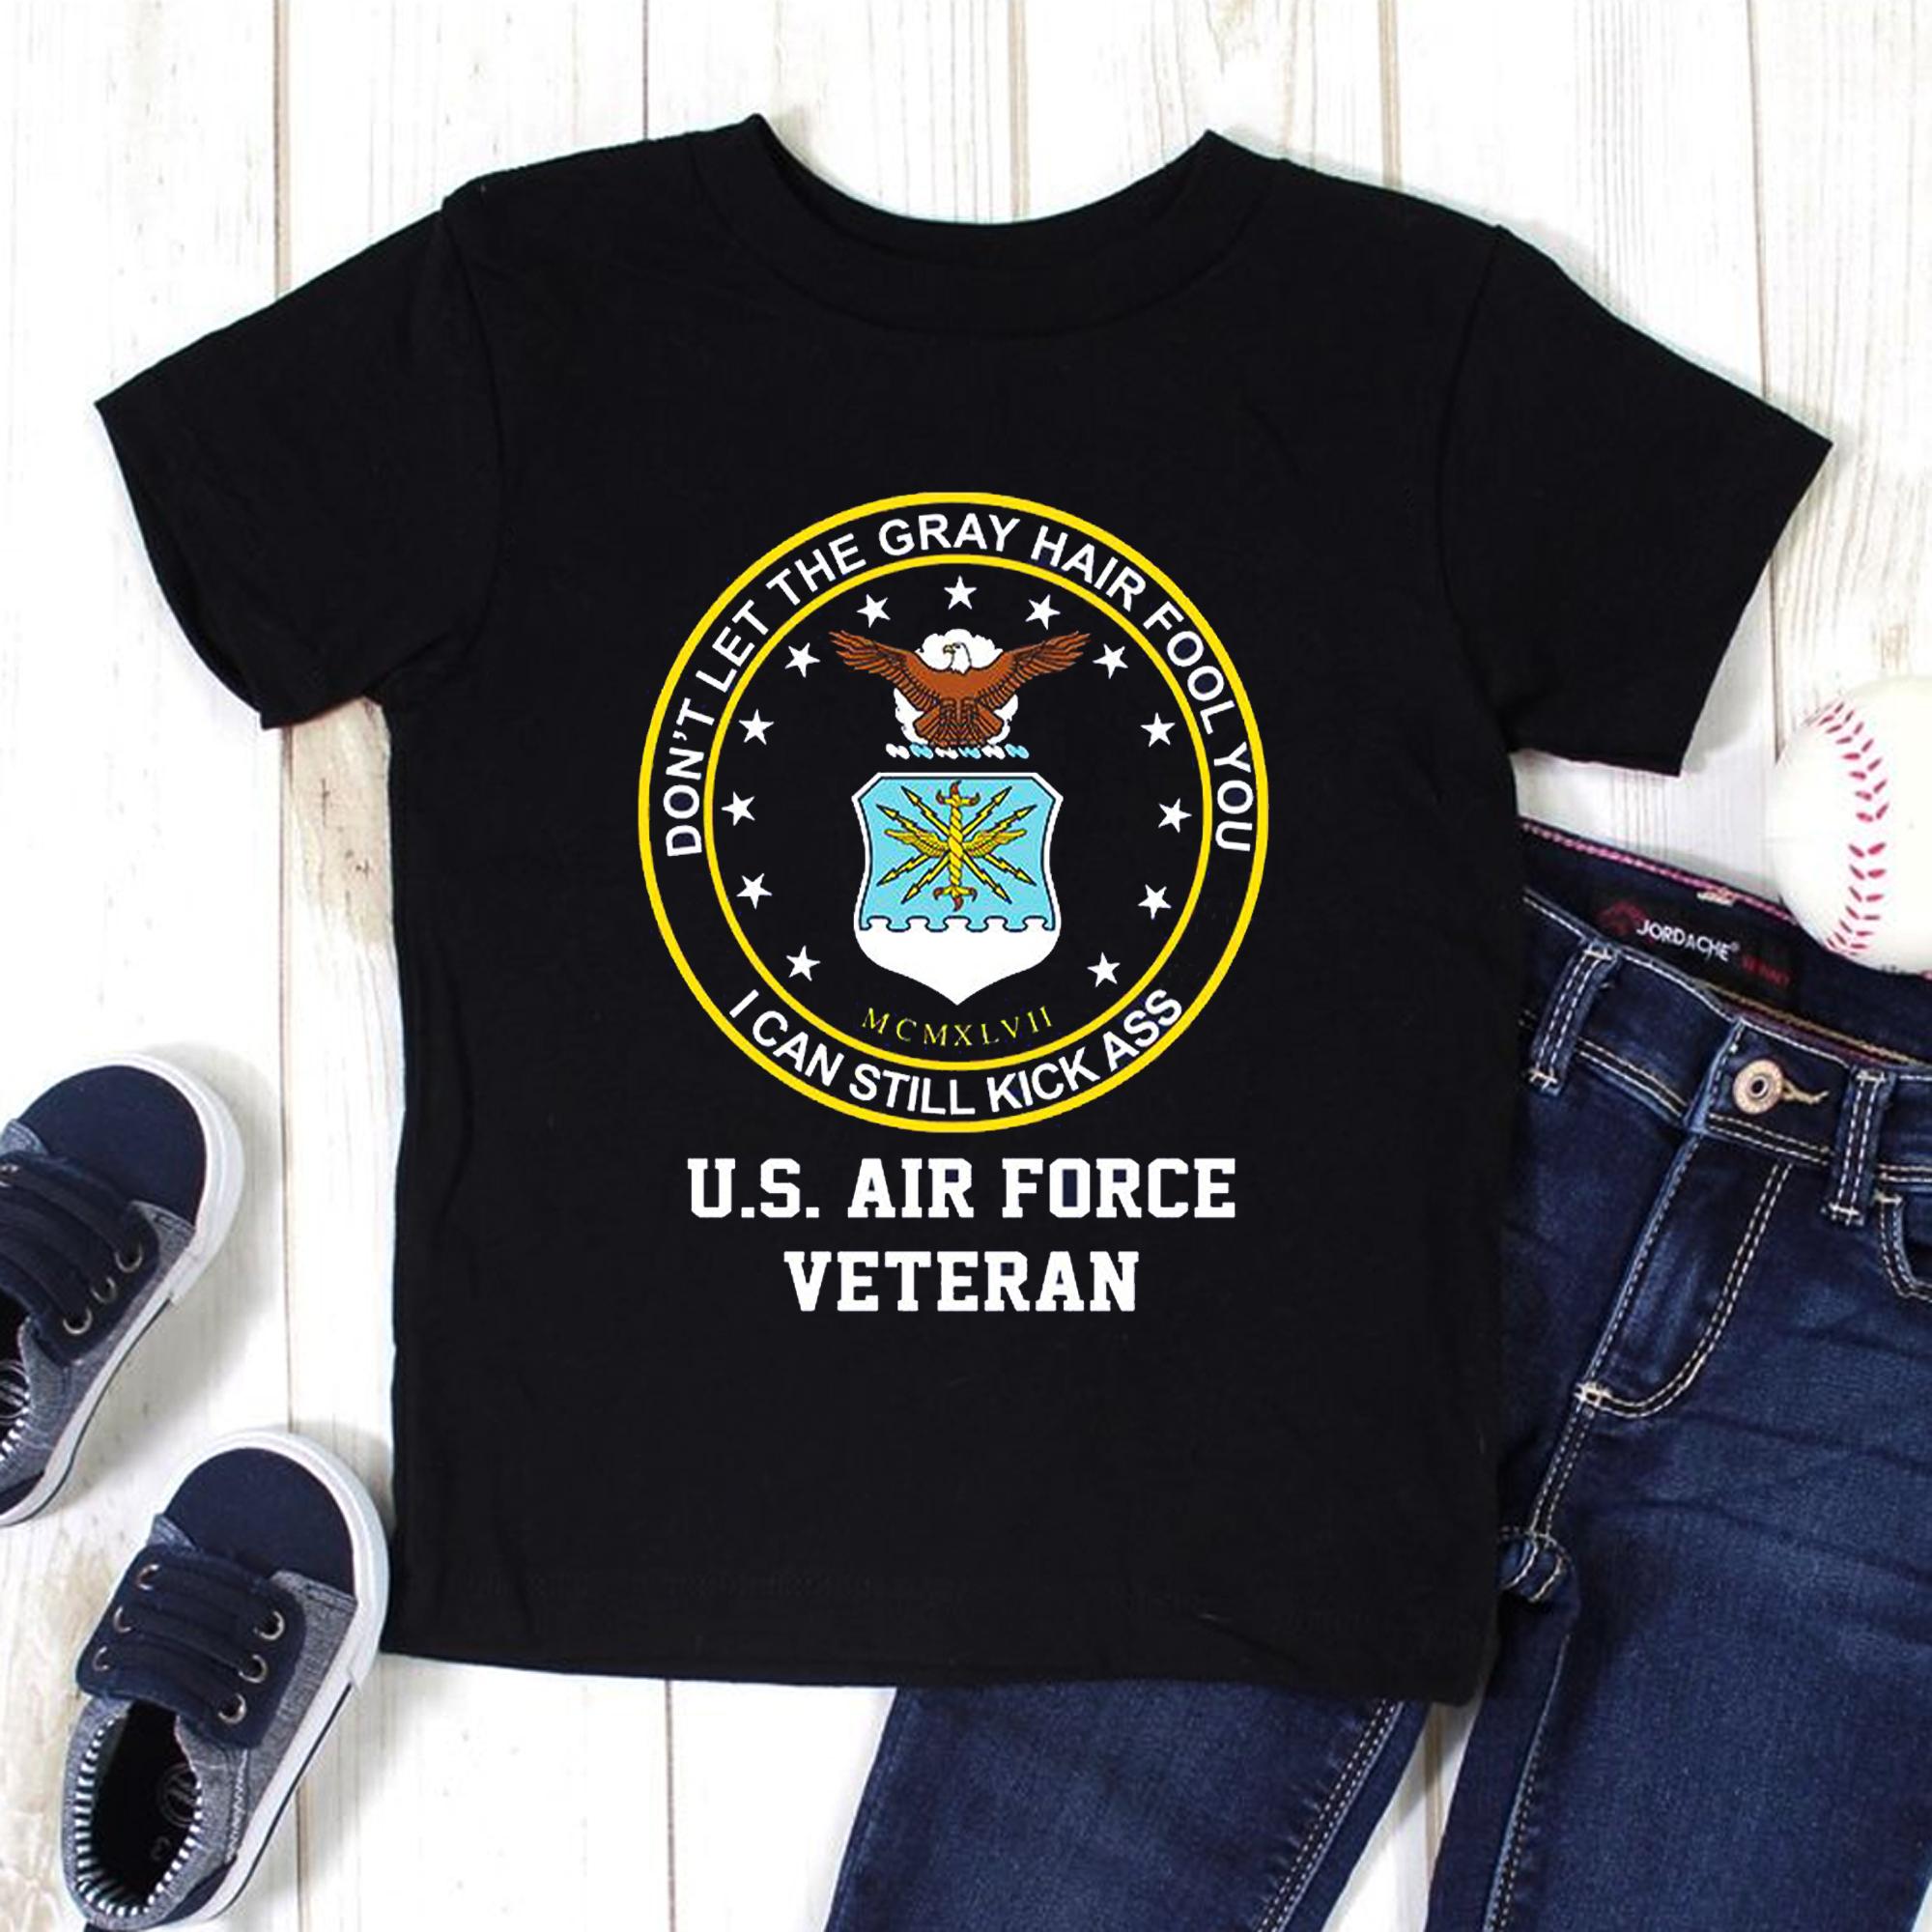 US Air Force Veteran Shirt Don't Let Grey Hair Fool You